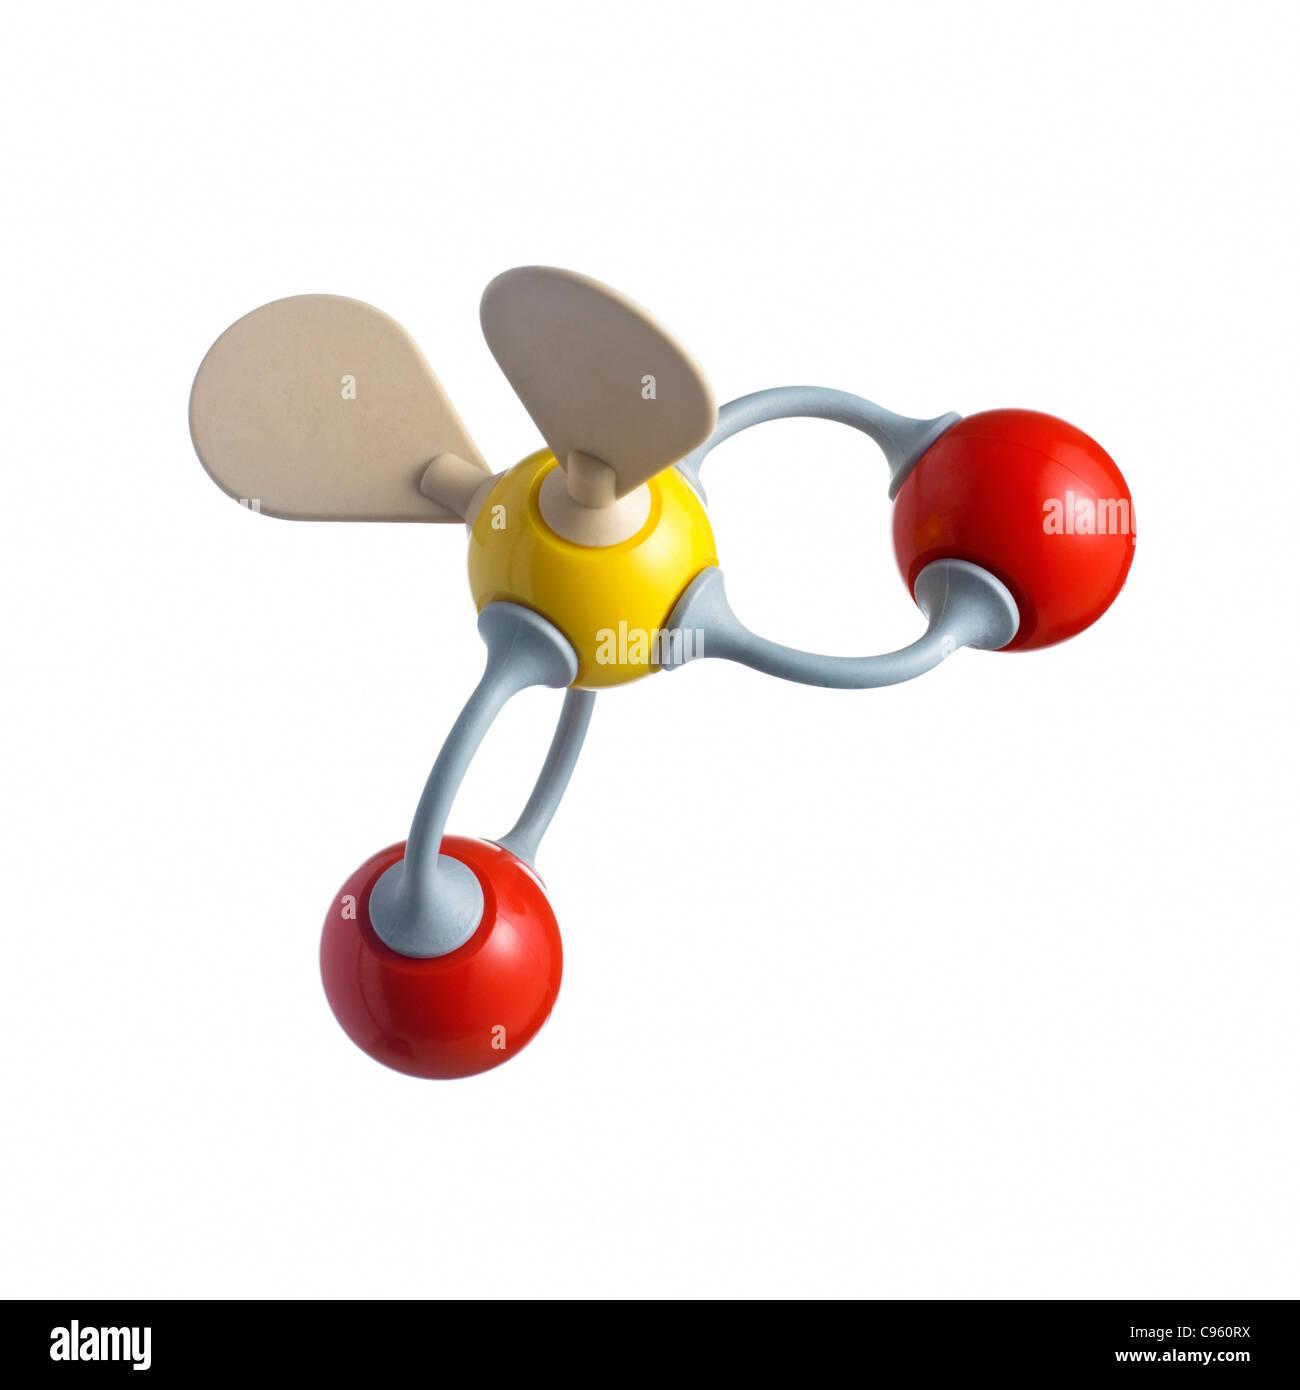 Sulphur dioxide molecule - Stock Image